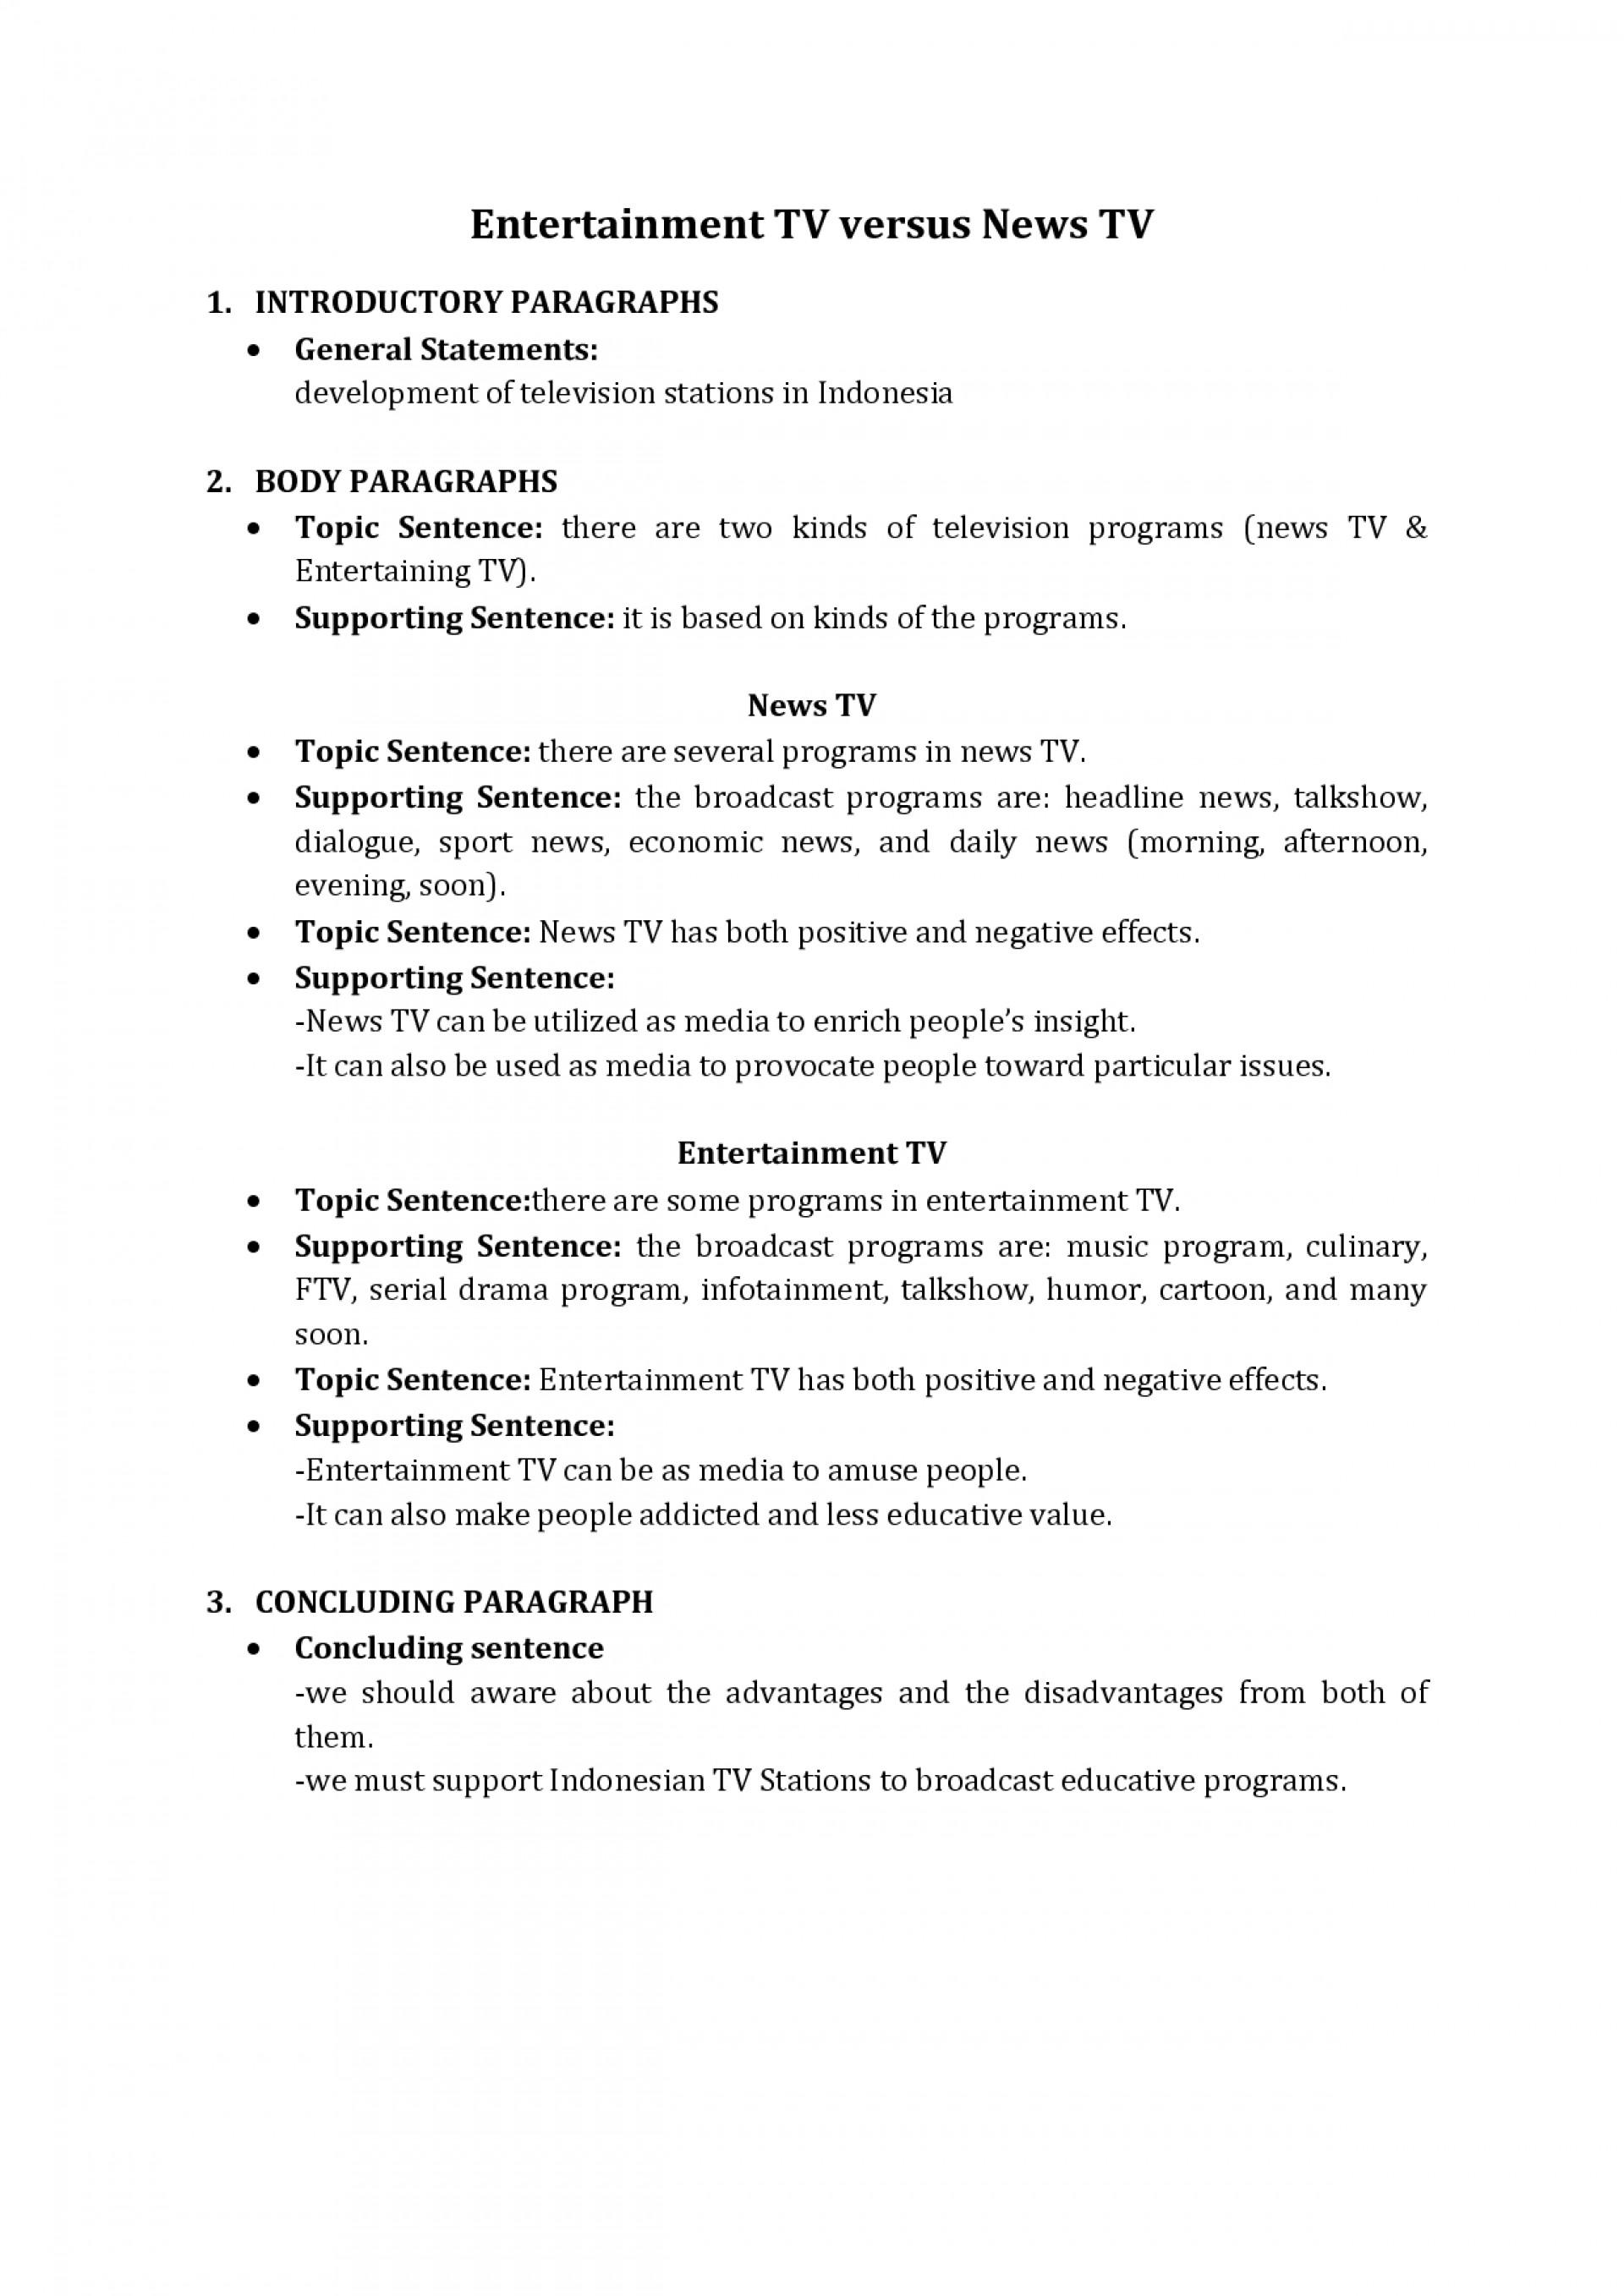 012 College Essay Outlines And Search On Pinterest In Format Of Impressive Outline Argumentative Sample Mla 1920